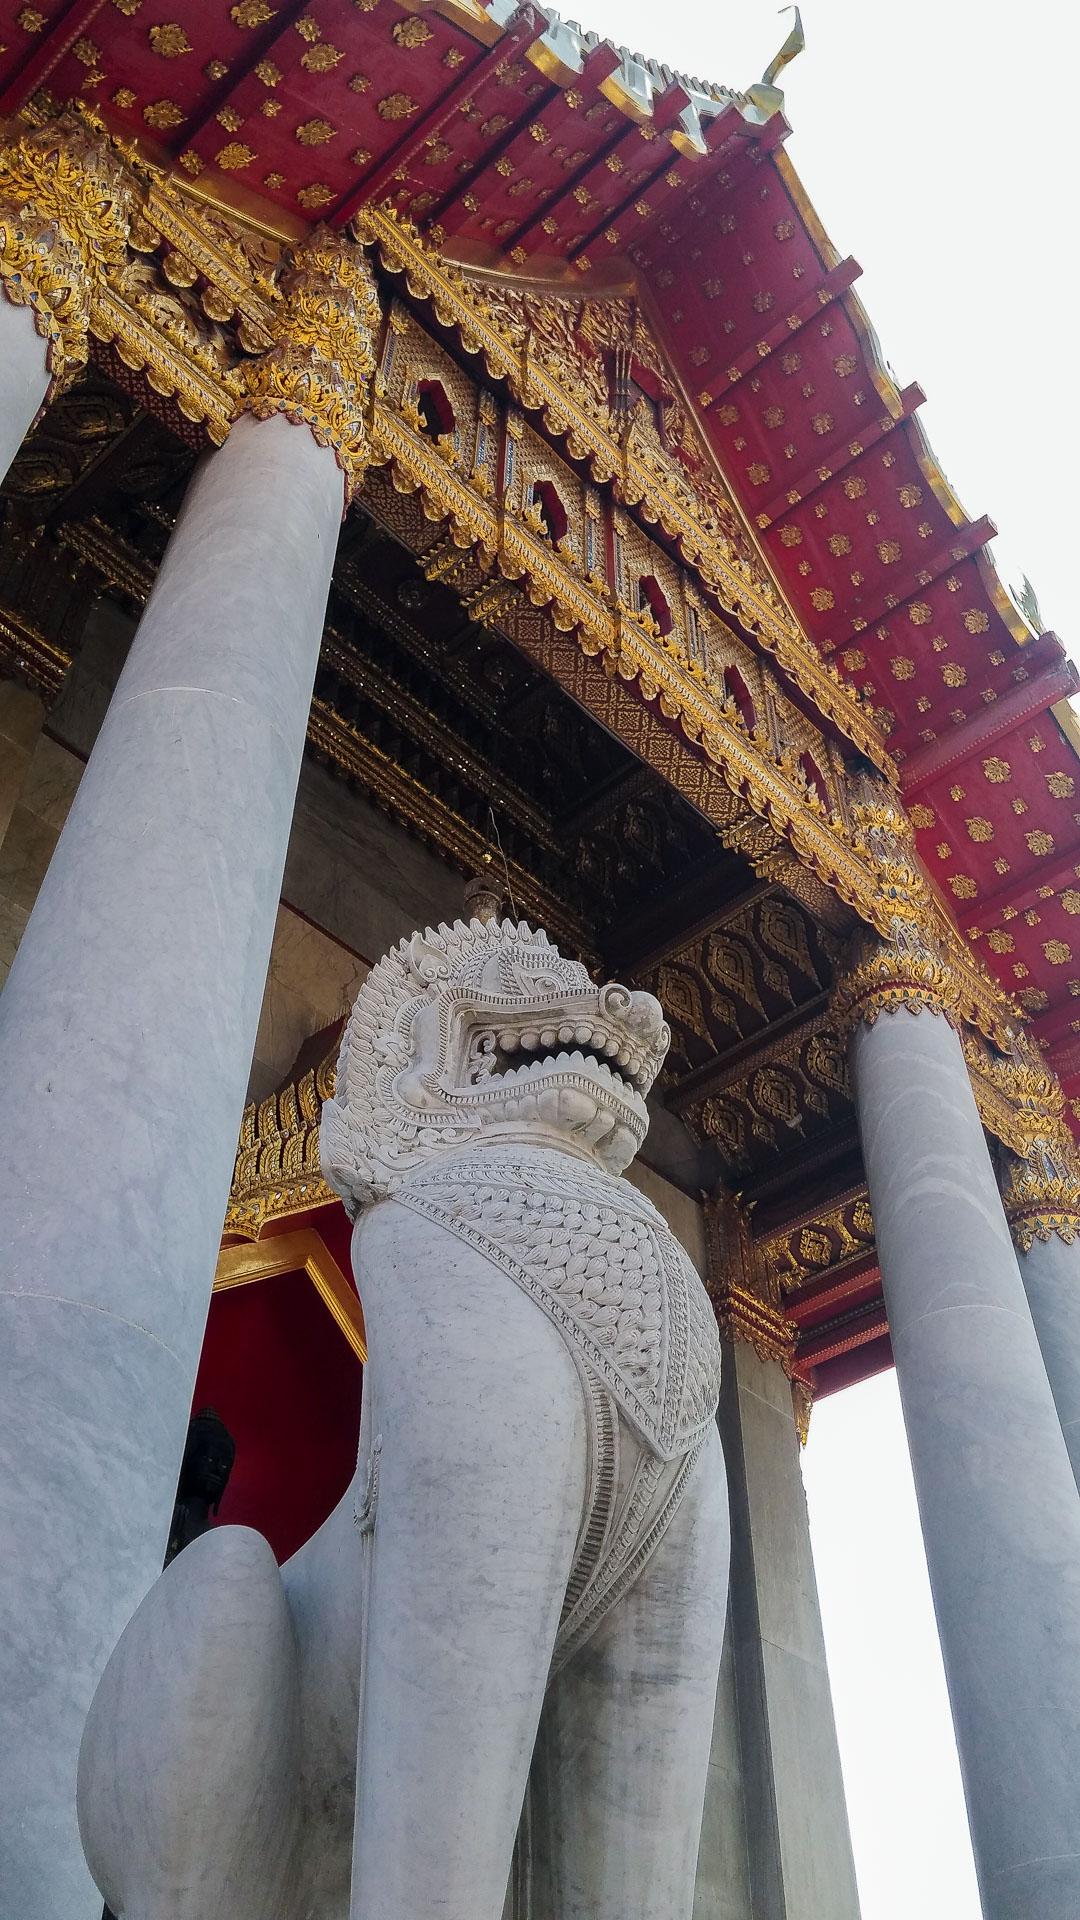 bangkok_0094-2